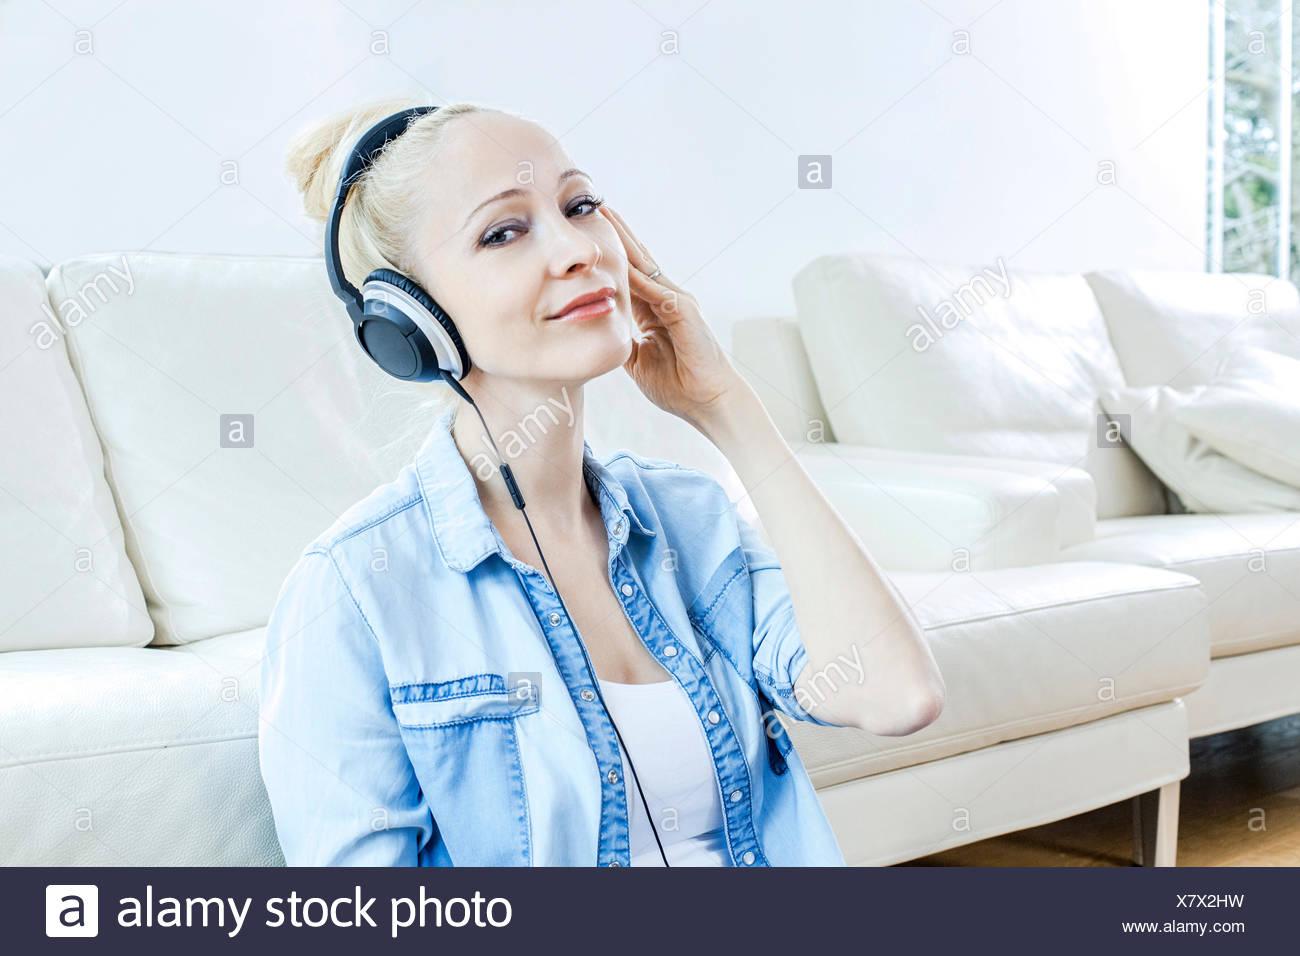 Blonde Frau Musikhören mit Kopfhörer Stockbild